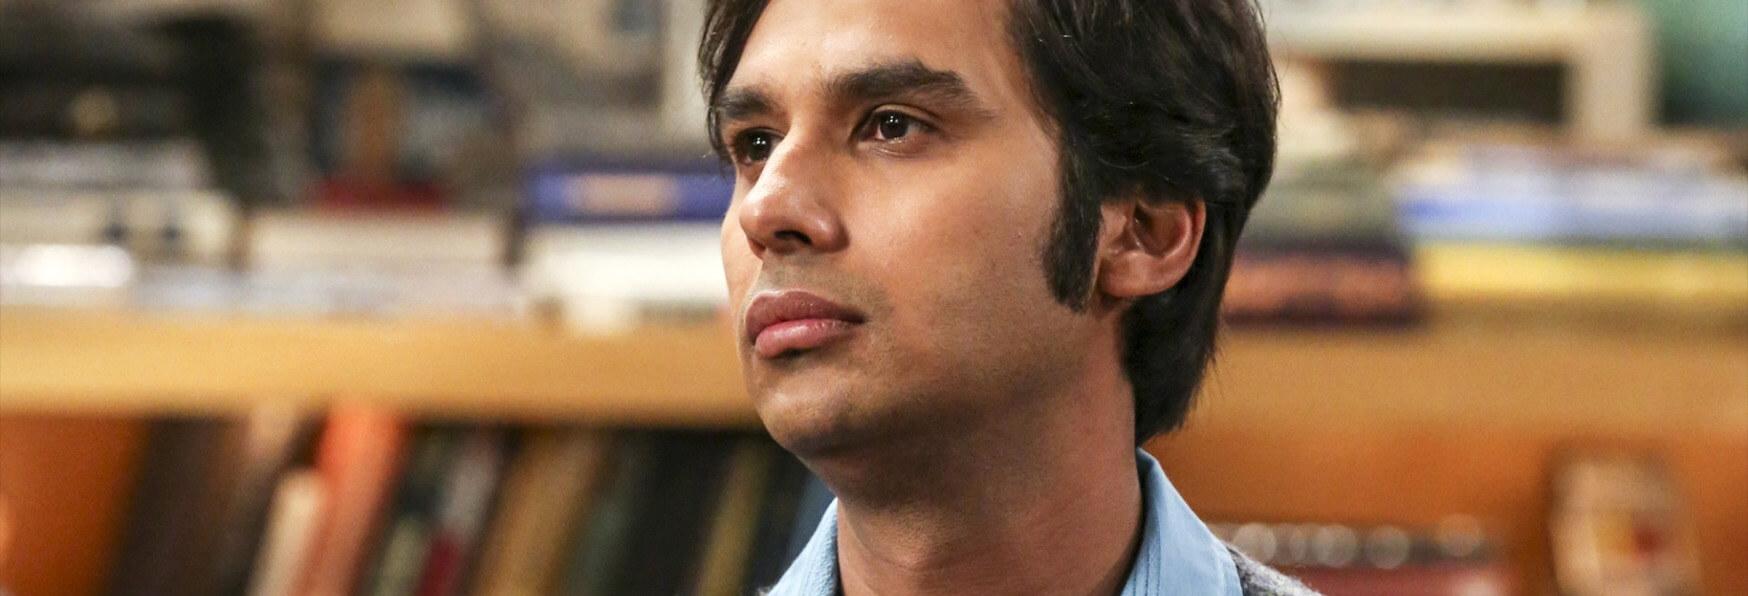 Raj si arrende? Recensione di The Big Bang Theory 12x02